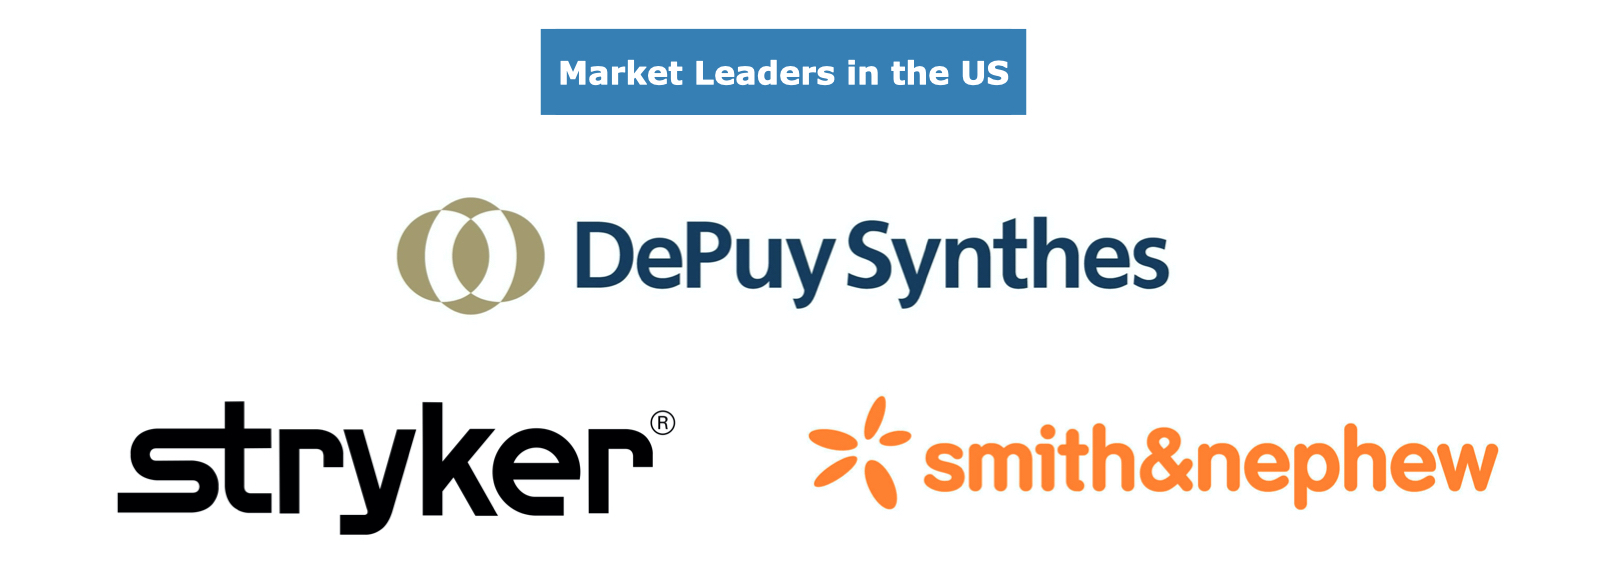 Competitors in the European Trauma Device Market, 2020